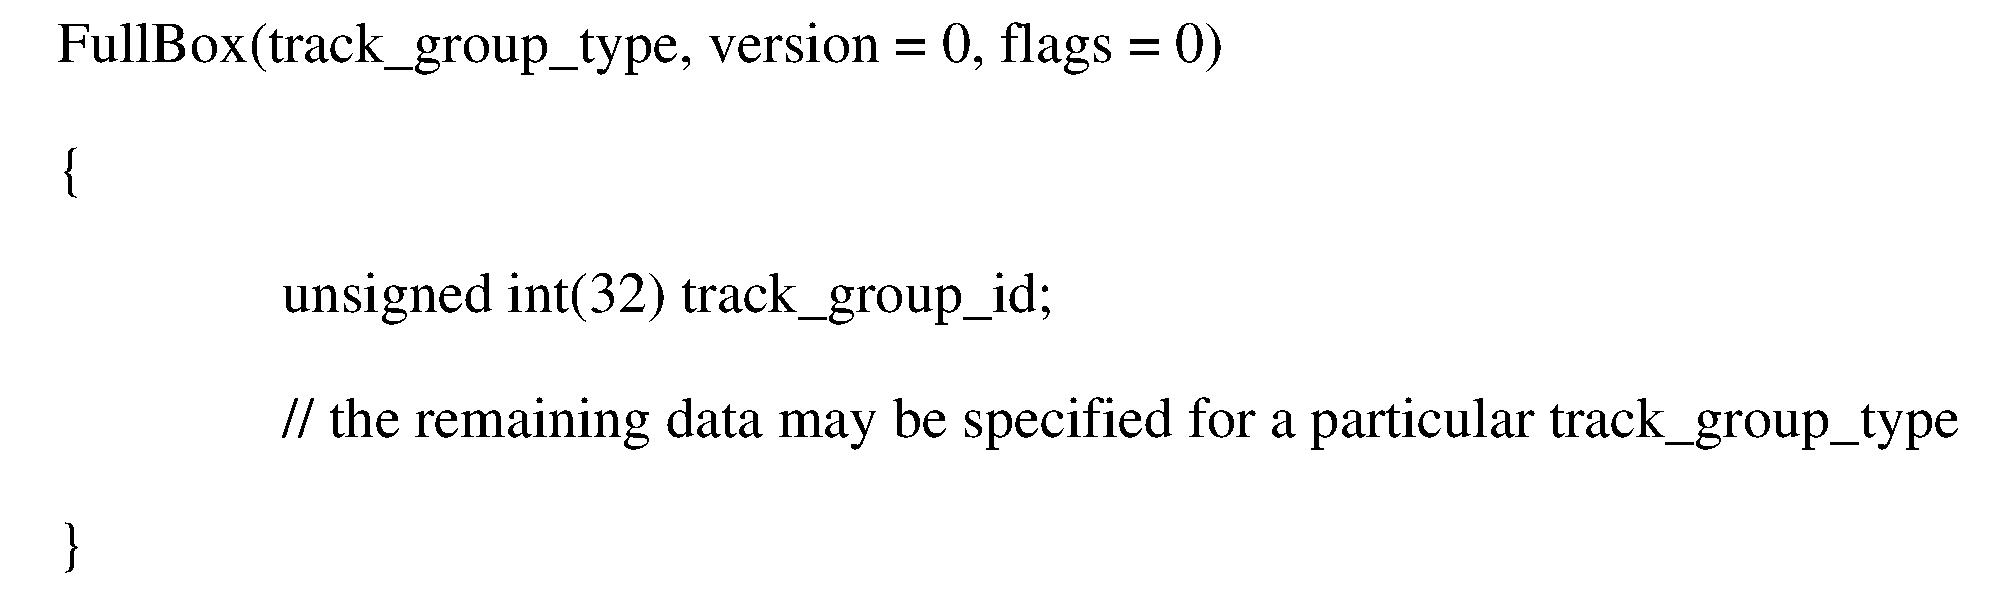 Figure 107124249-A0305-02-0026-5